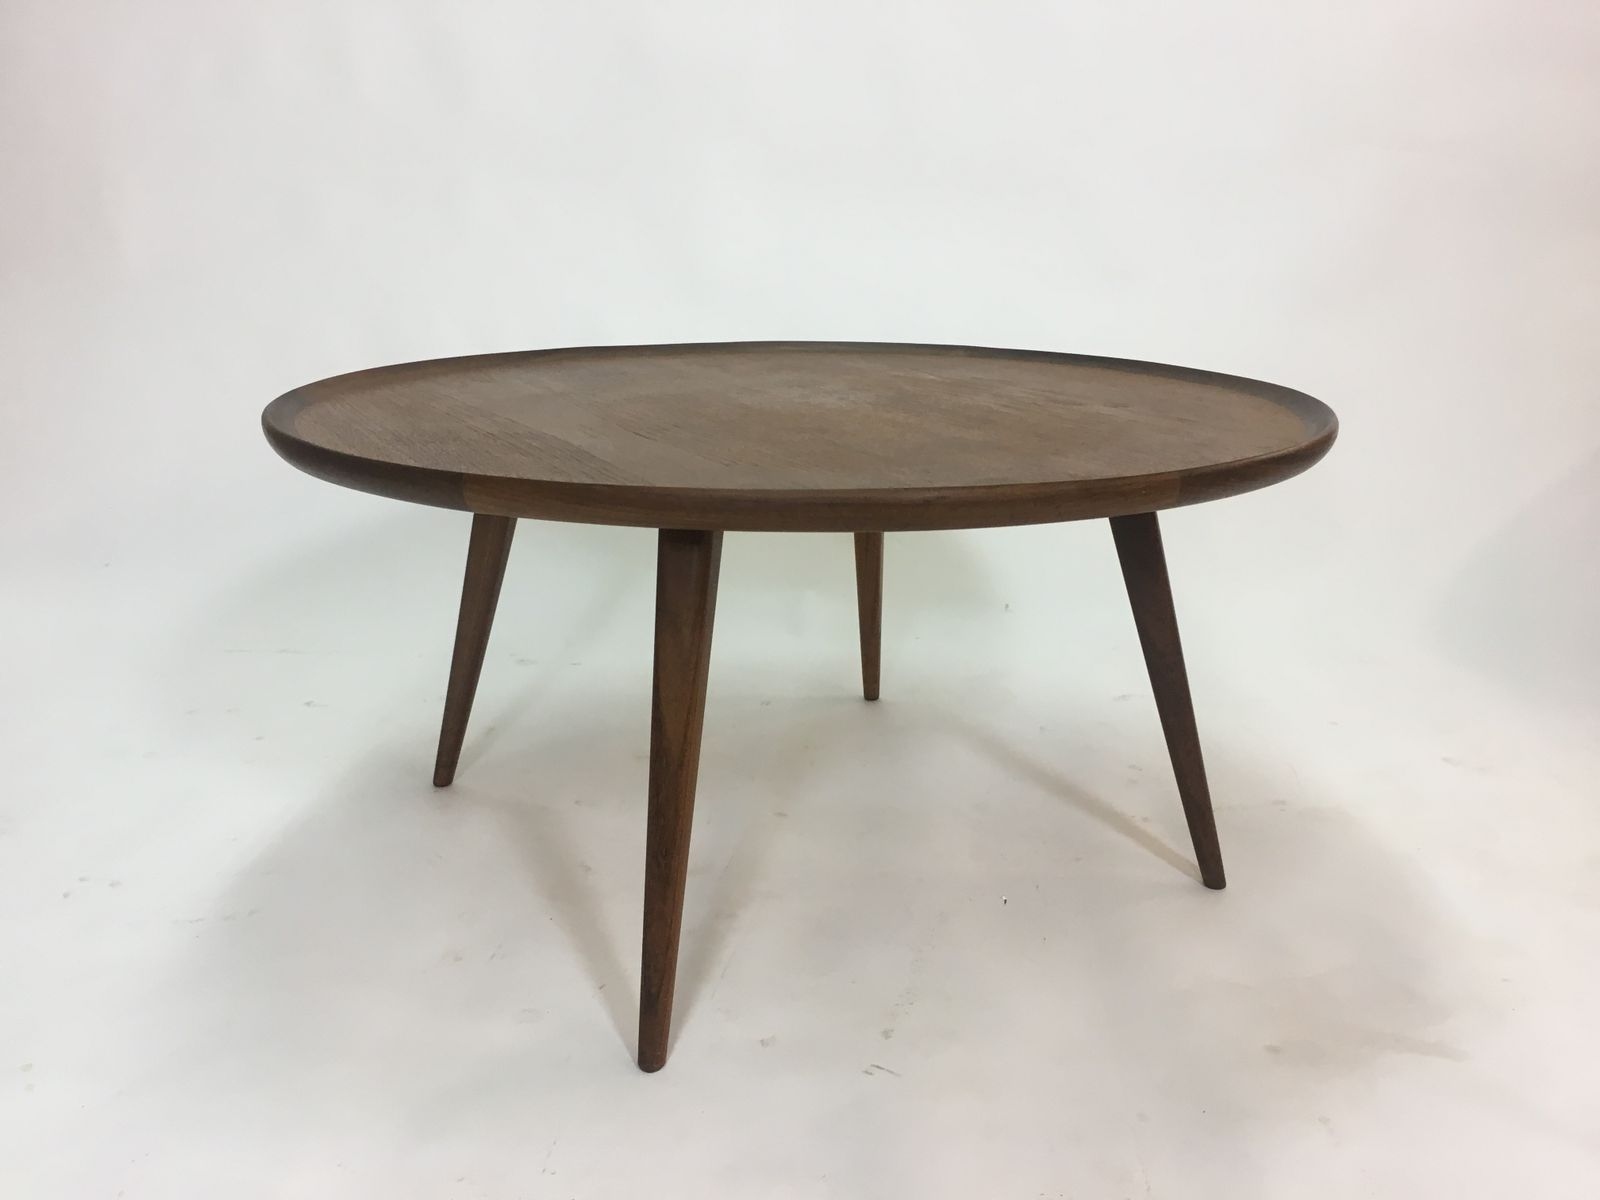 Mid Century Round Teak Coffee Table 1950s 8 561 00